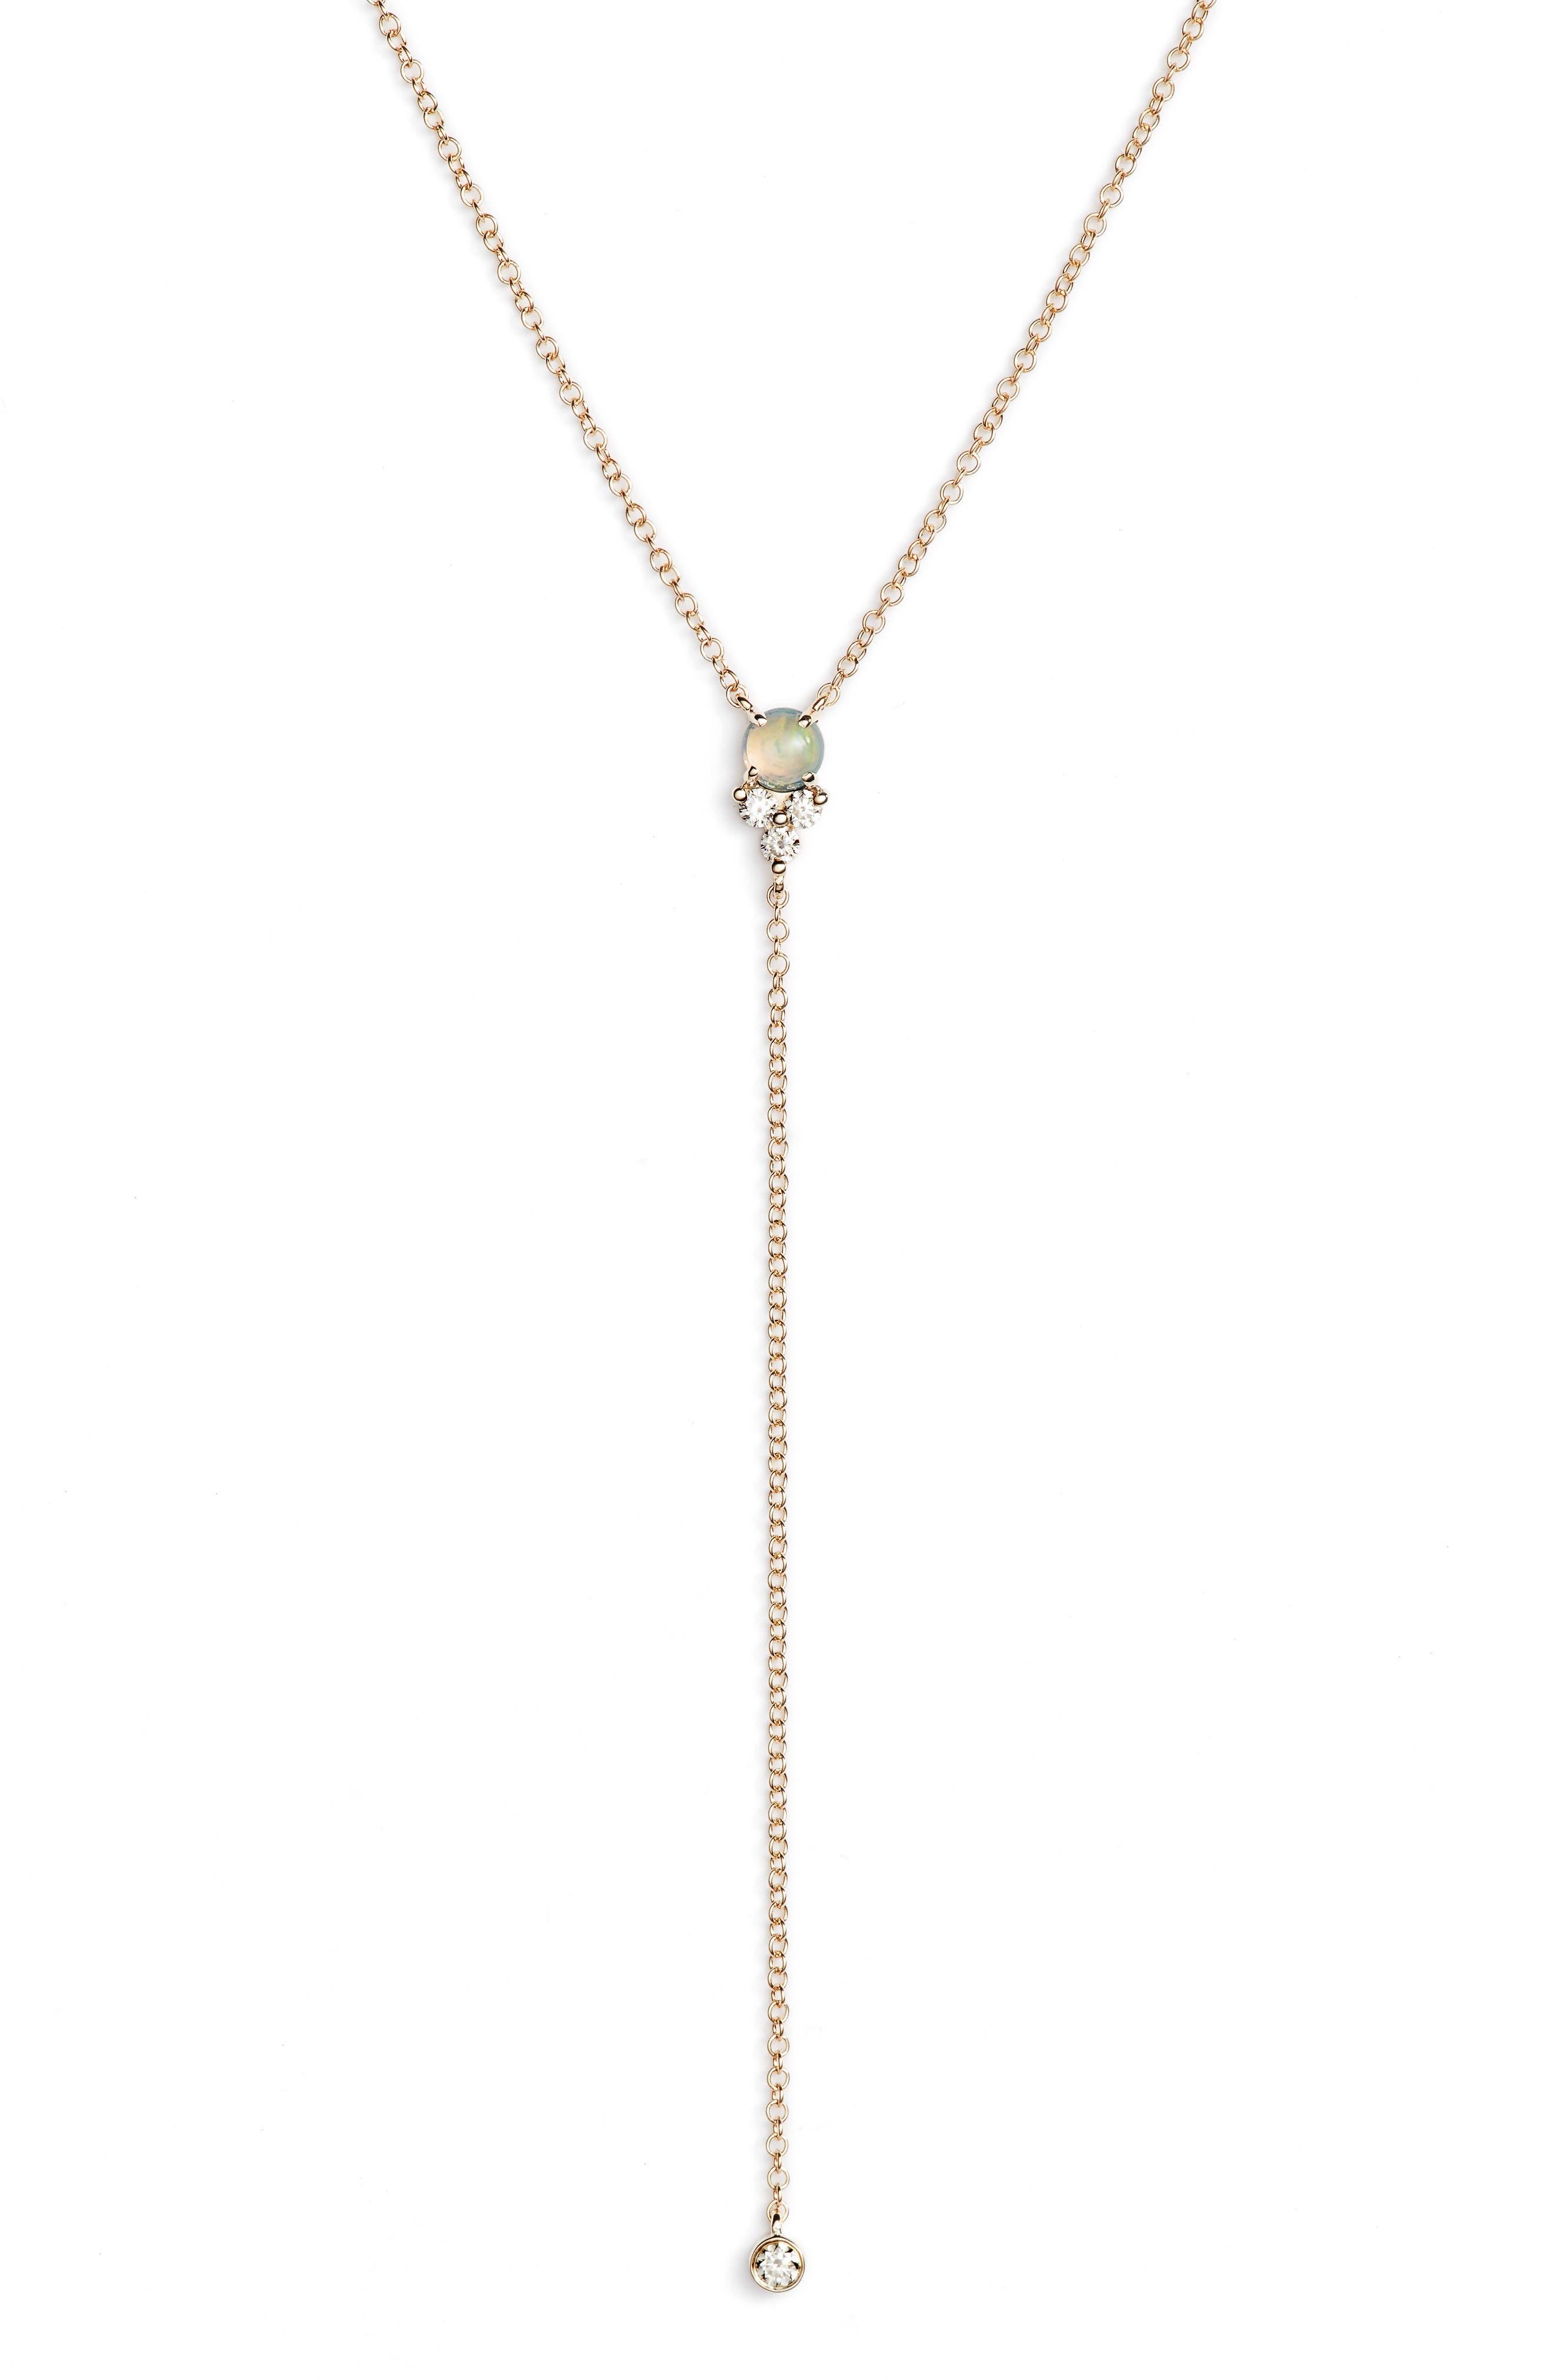 Diamond Trio Stone Lariat Necklace,                         Main,                         color, Yellow Gold/ Opal